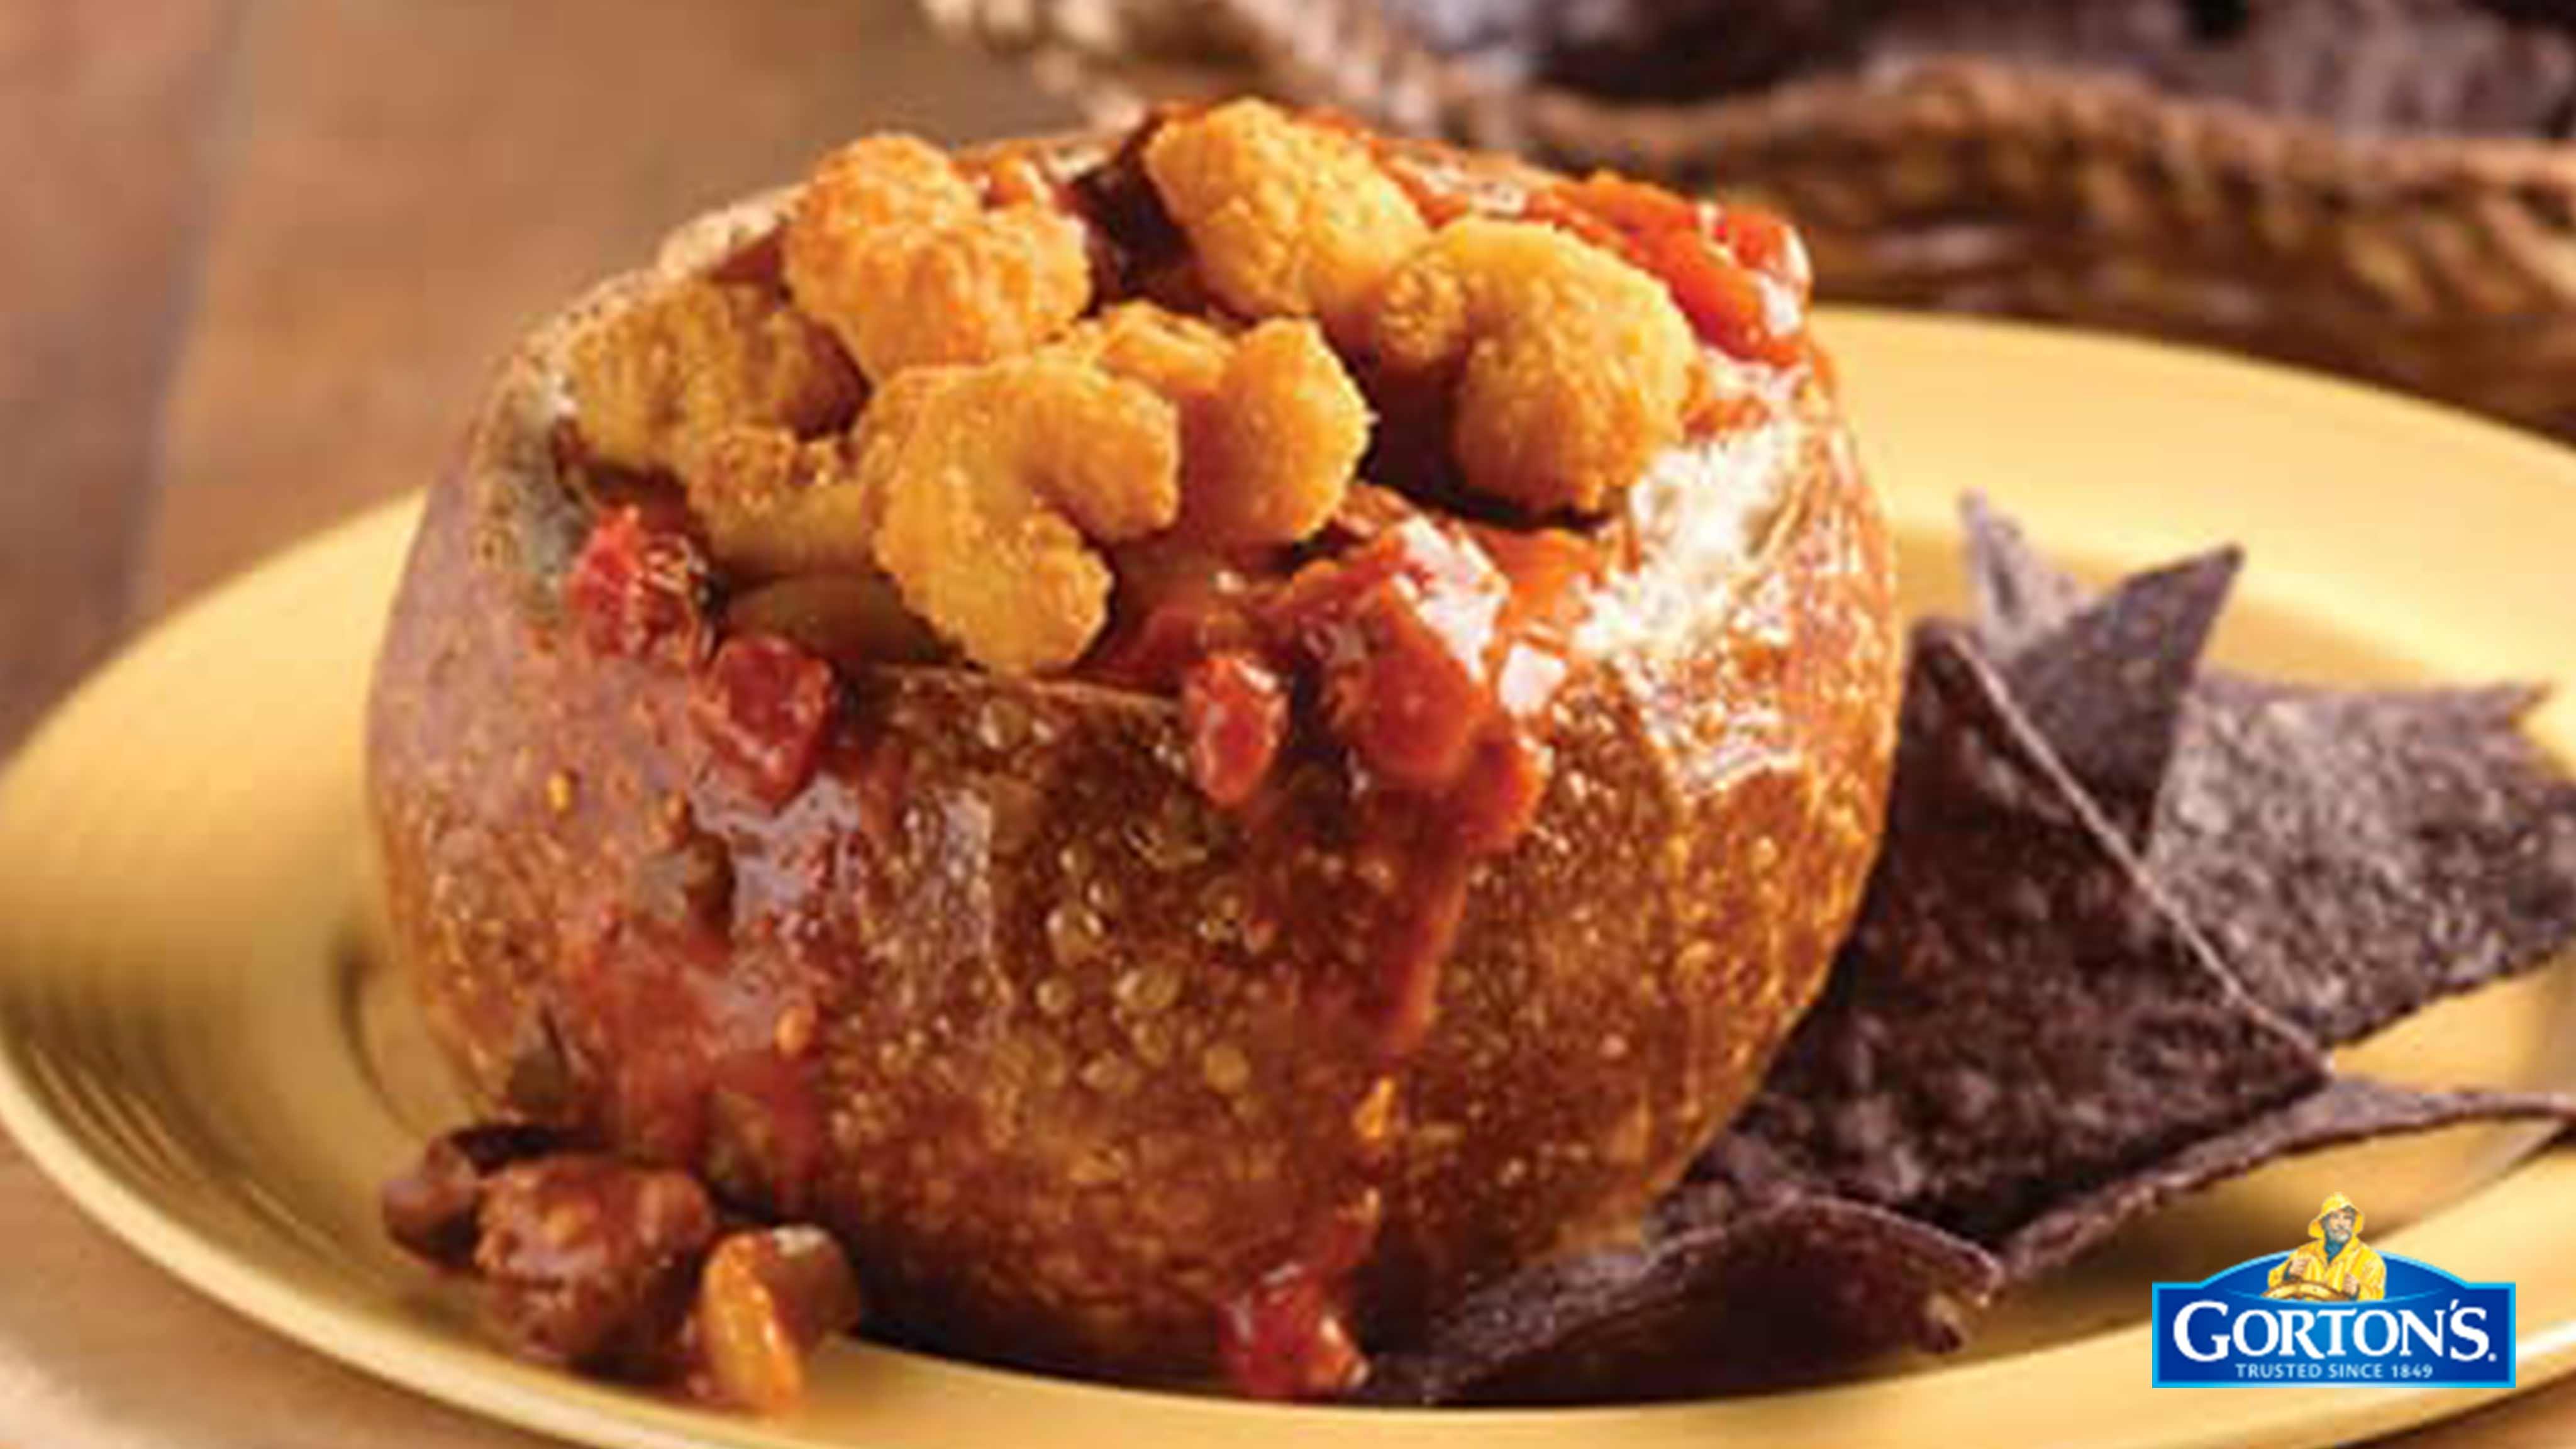 Image for Recipe Popcorn Shrimp Chili and Cheese Bread Bowl